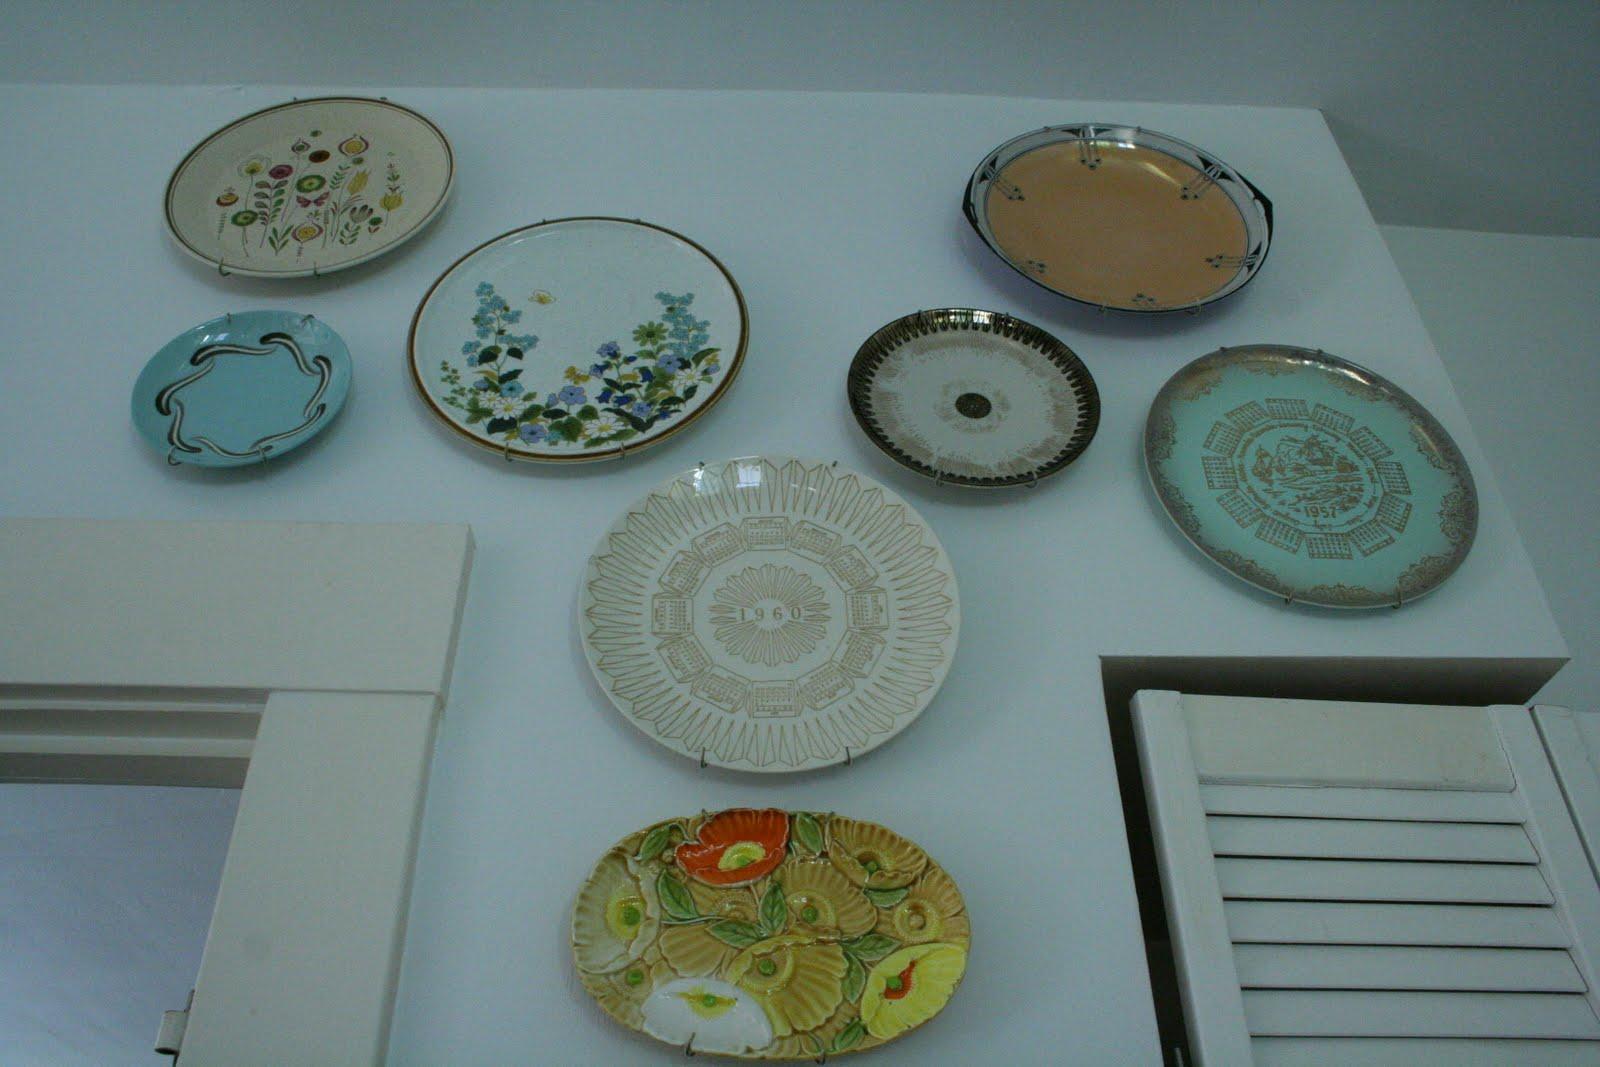 Kitchen Wall Decor With Plates : Kitchen wall plates design photos